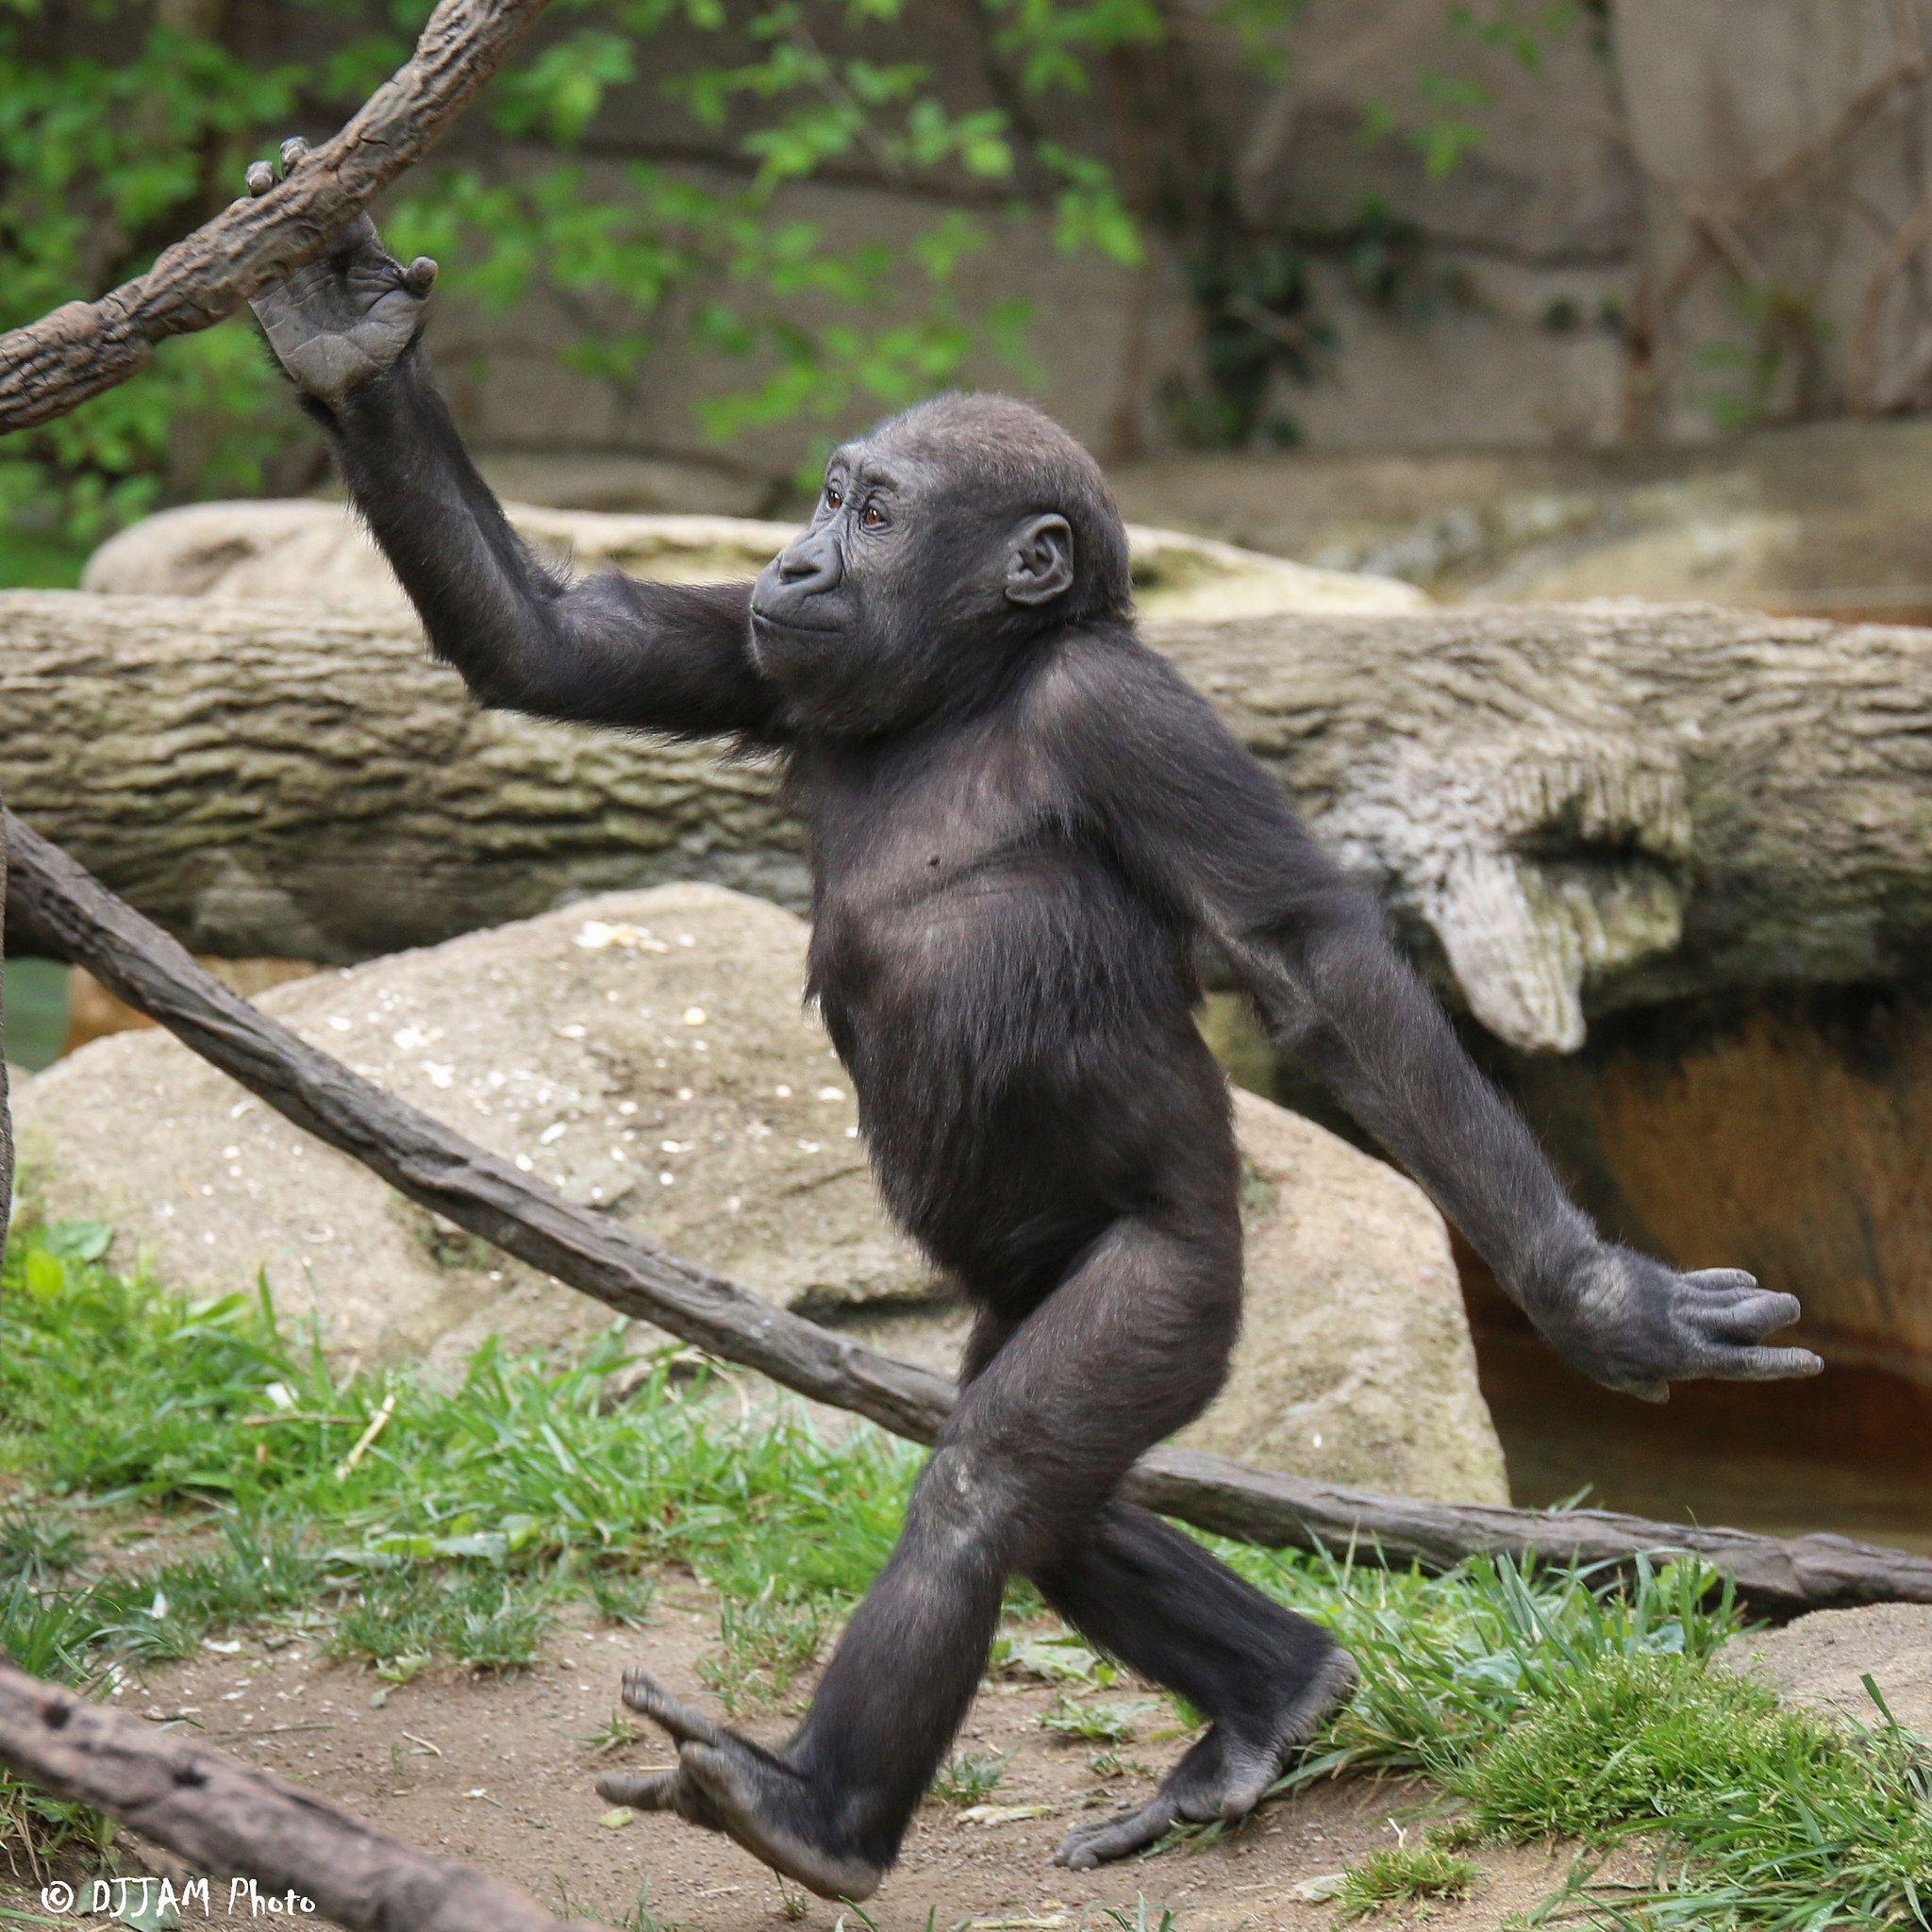 Erected chimpanzee penis